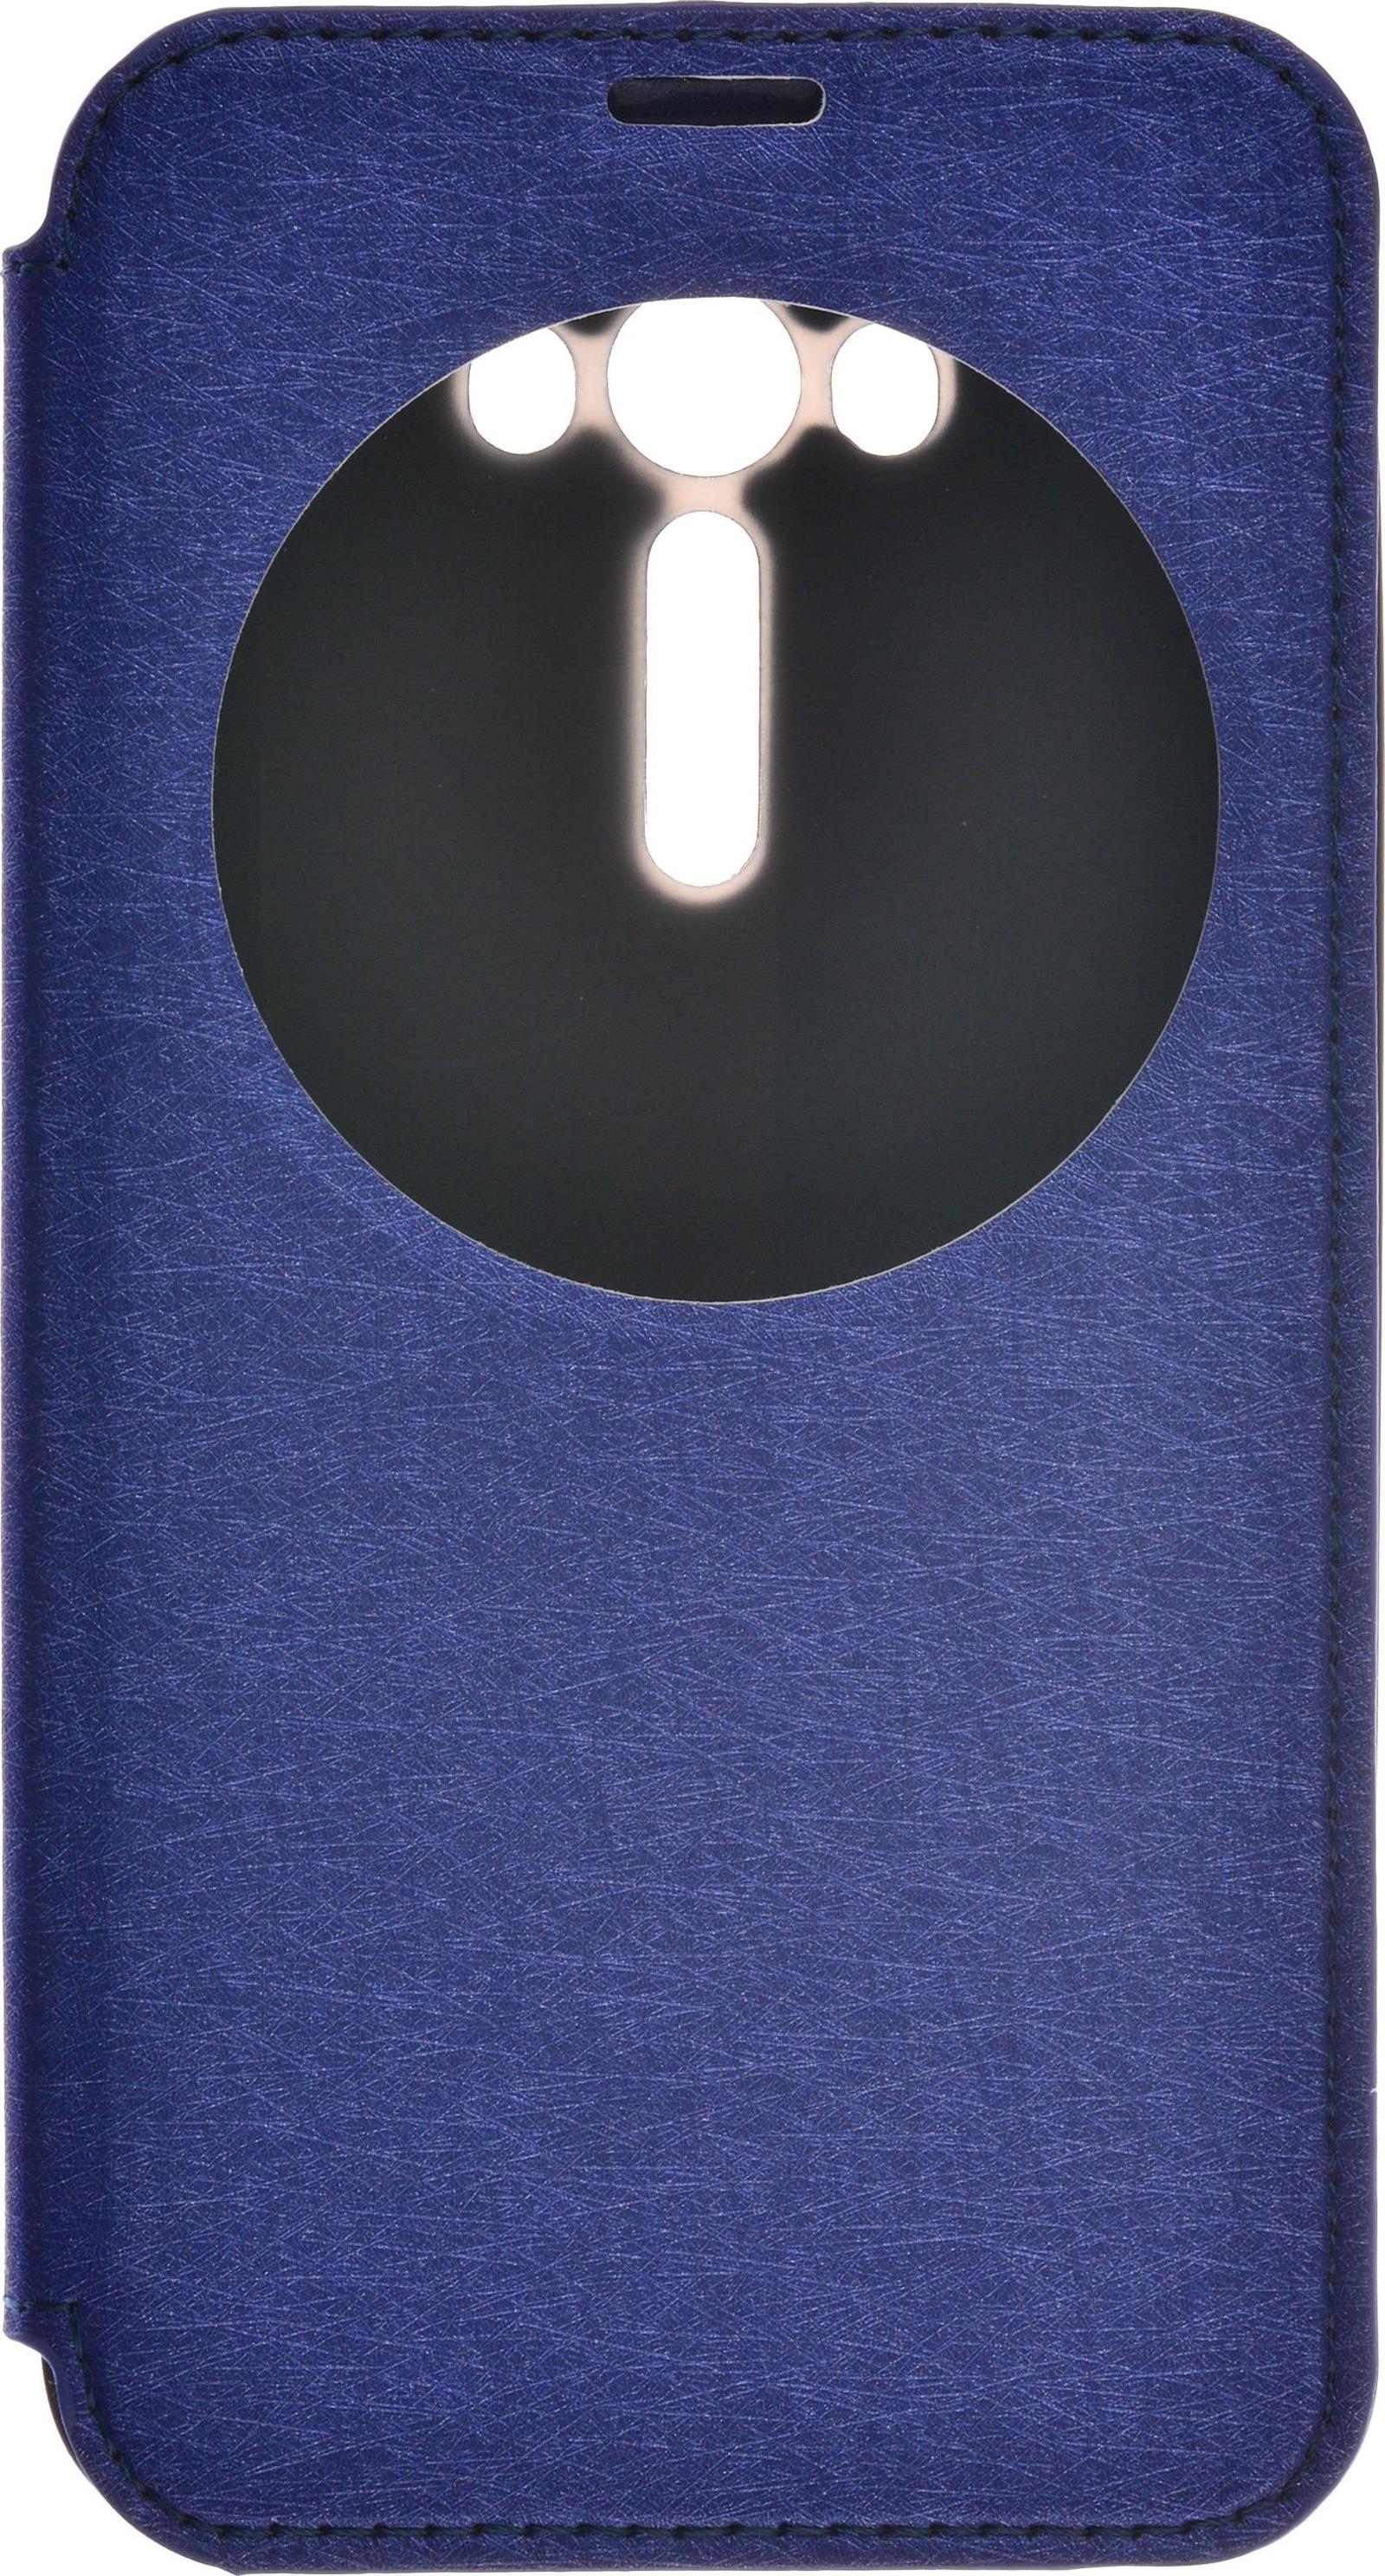 купить Чехол для сотового телефона skinBOX MS, 4660041407273, синий онлайн